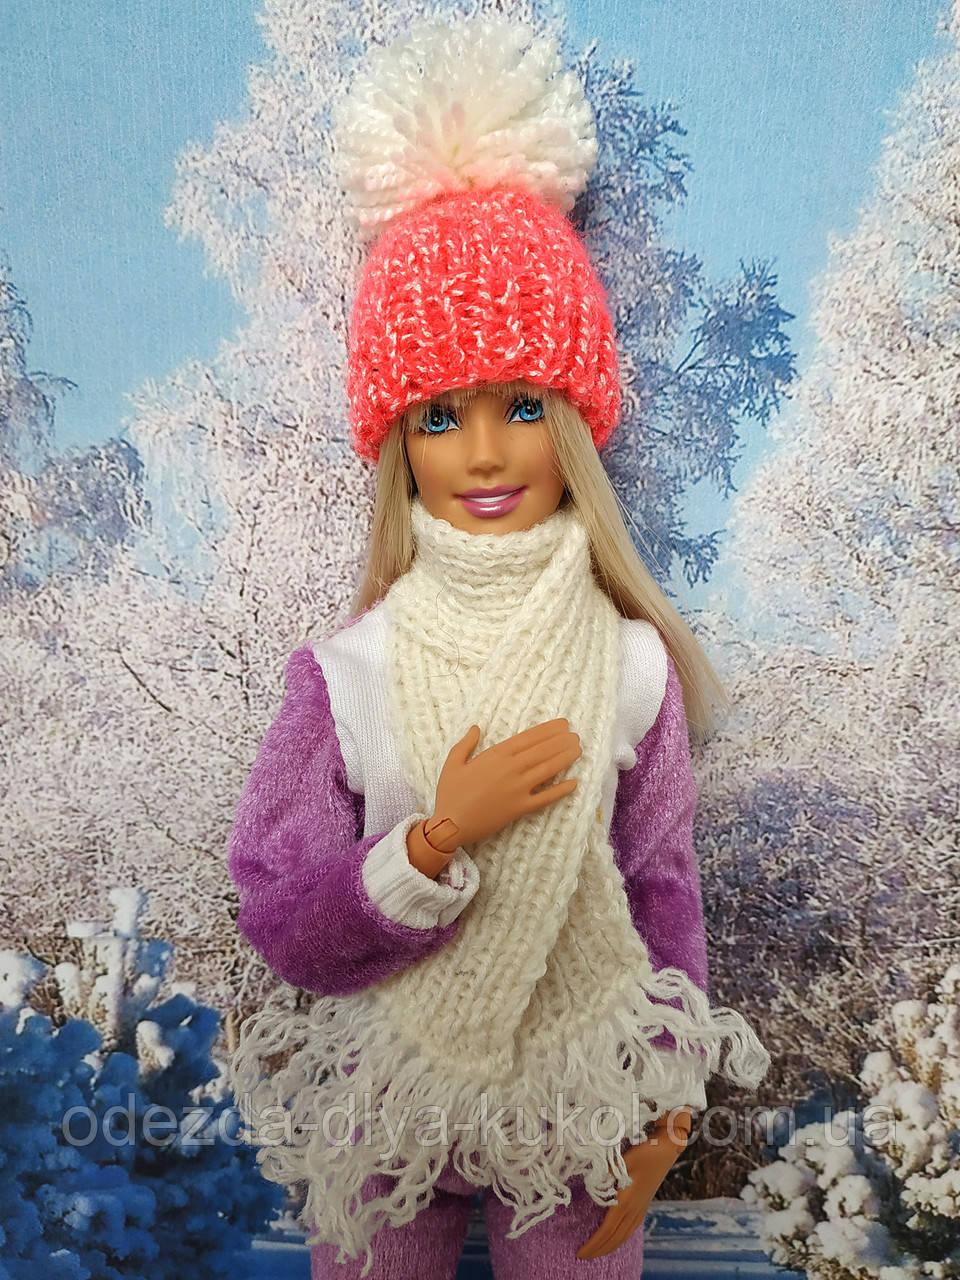 Одяг для ляльок Барбі - шапка і шарфік